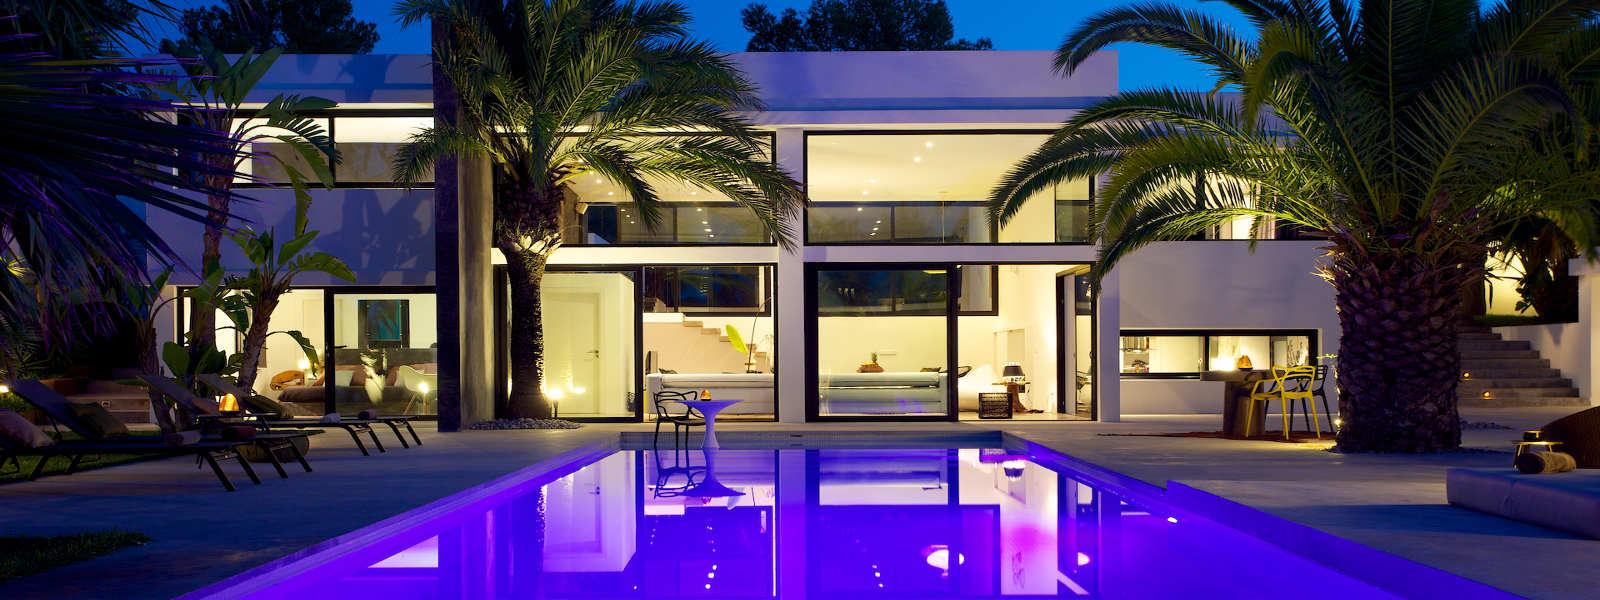 Ibiza rentals Villa with pool and exotic garden